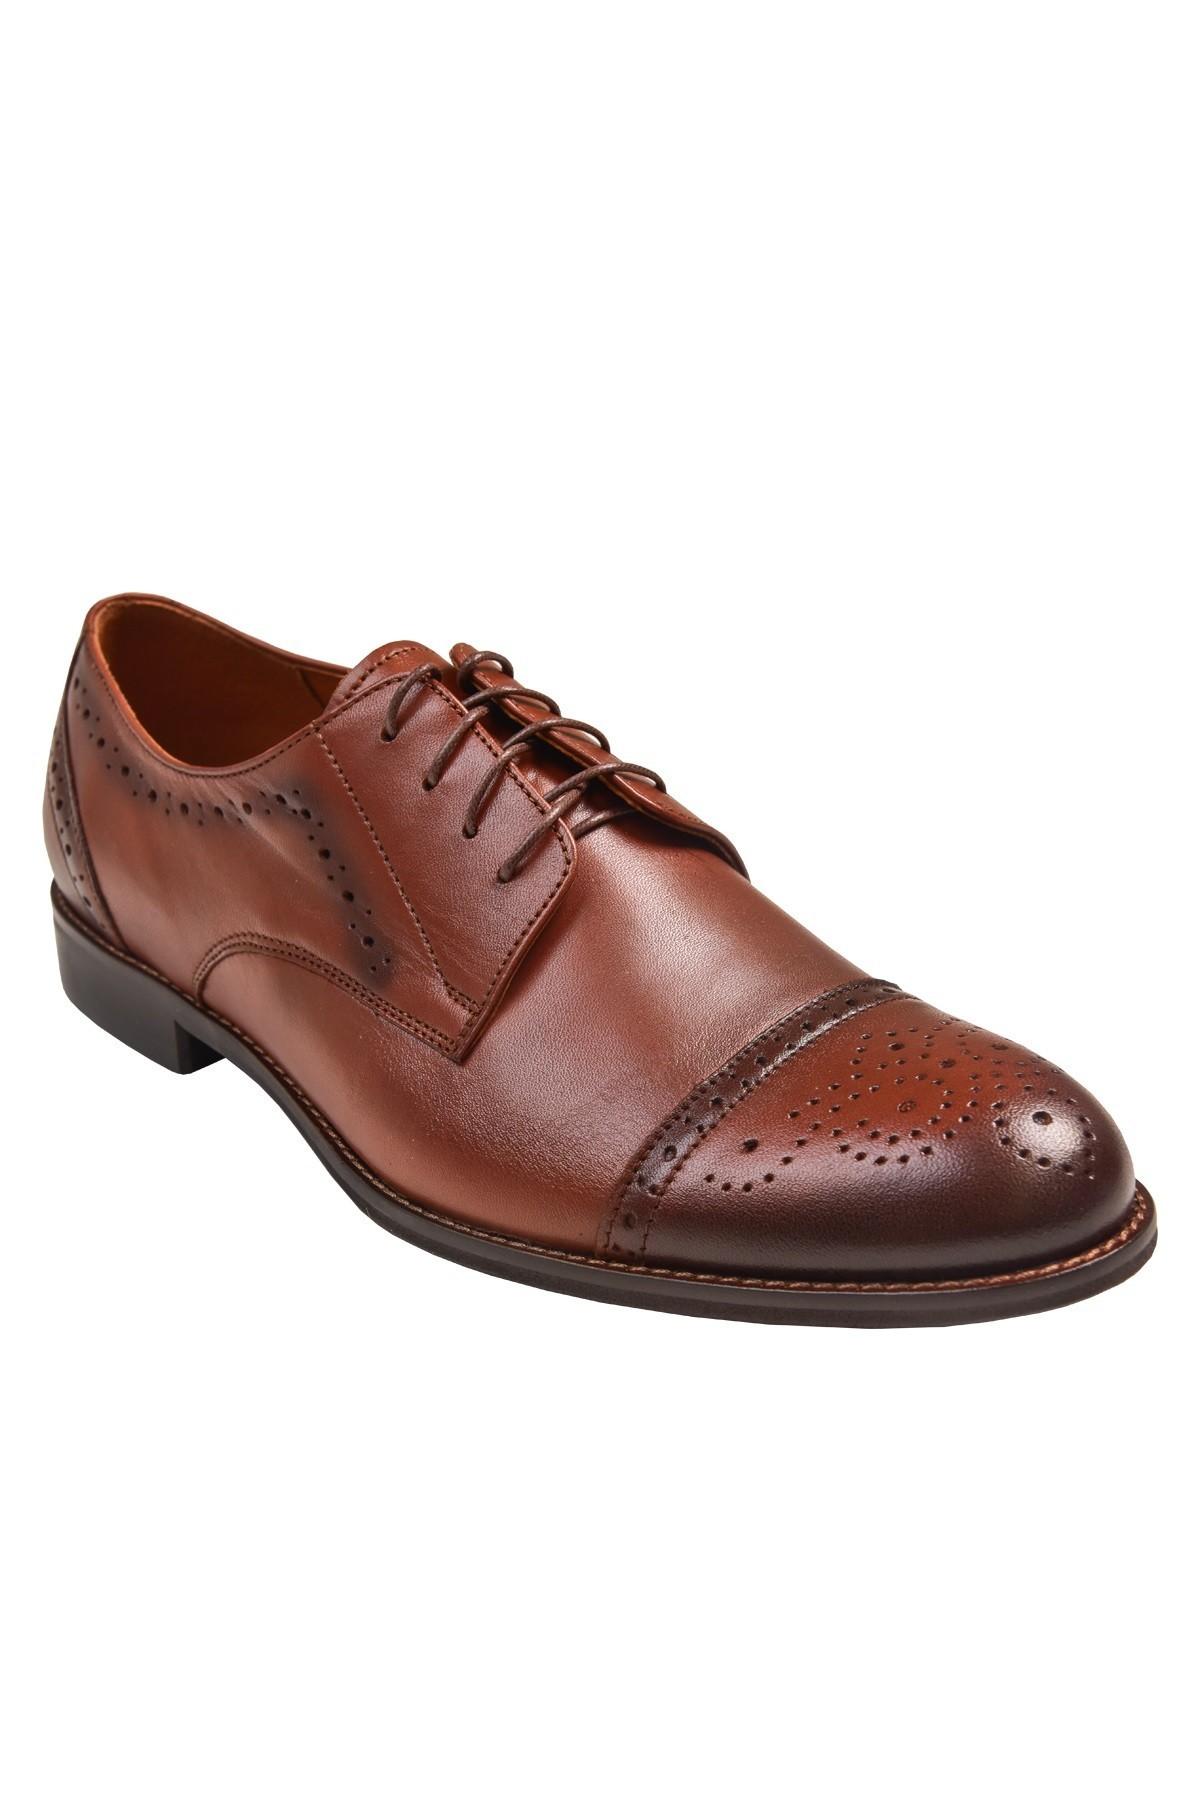 Eleganckie buty męskie do garnituru skóra